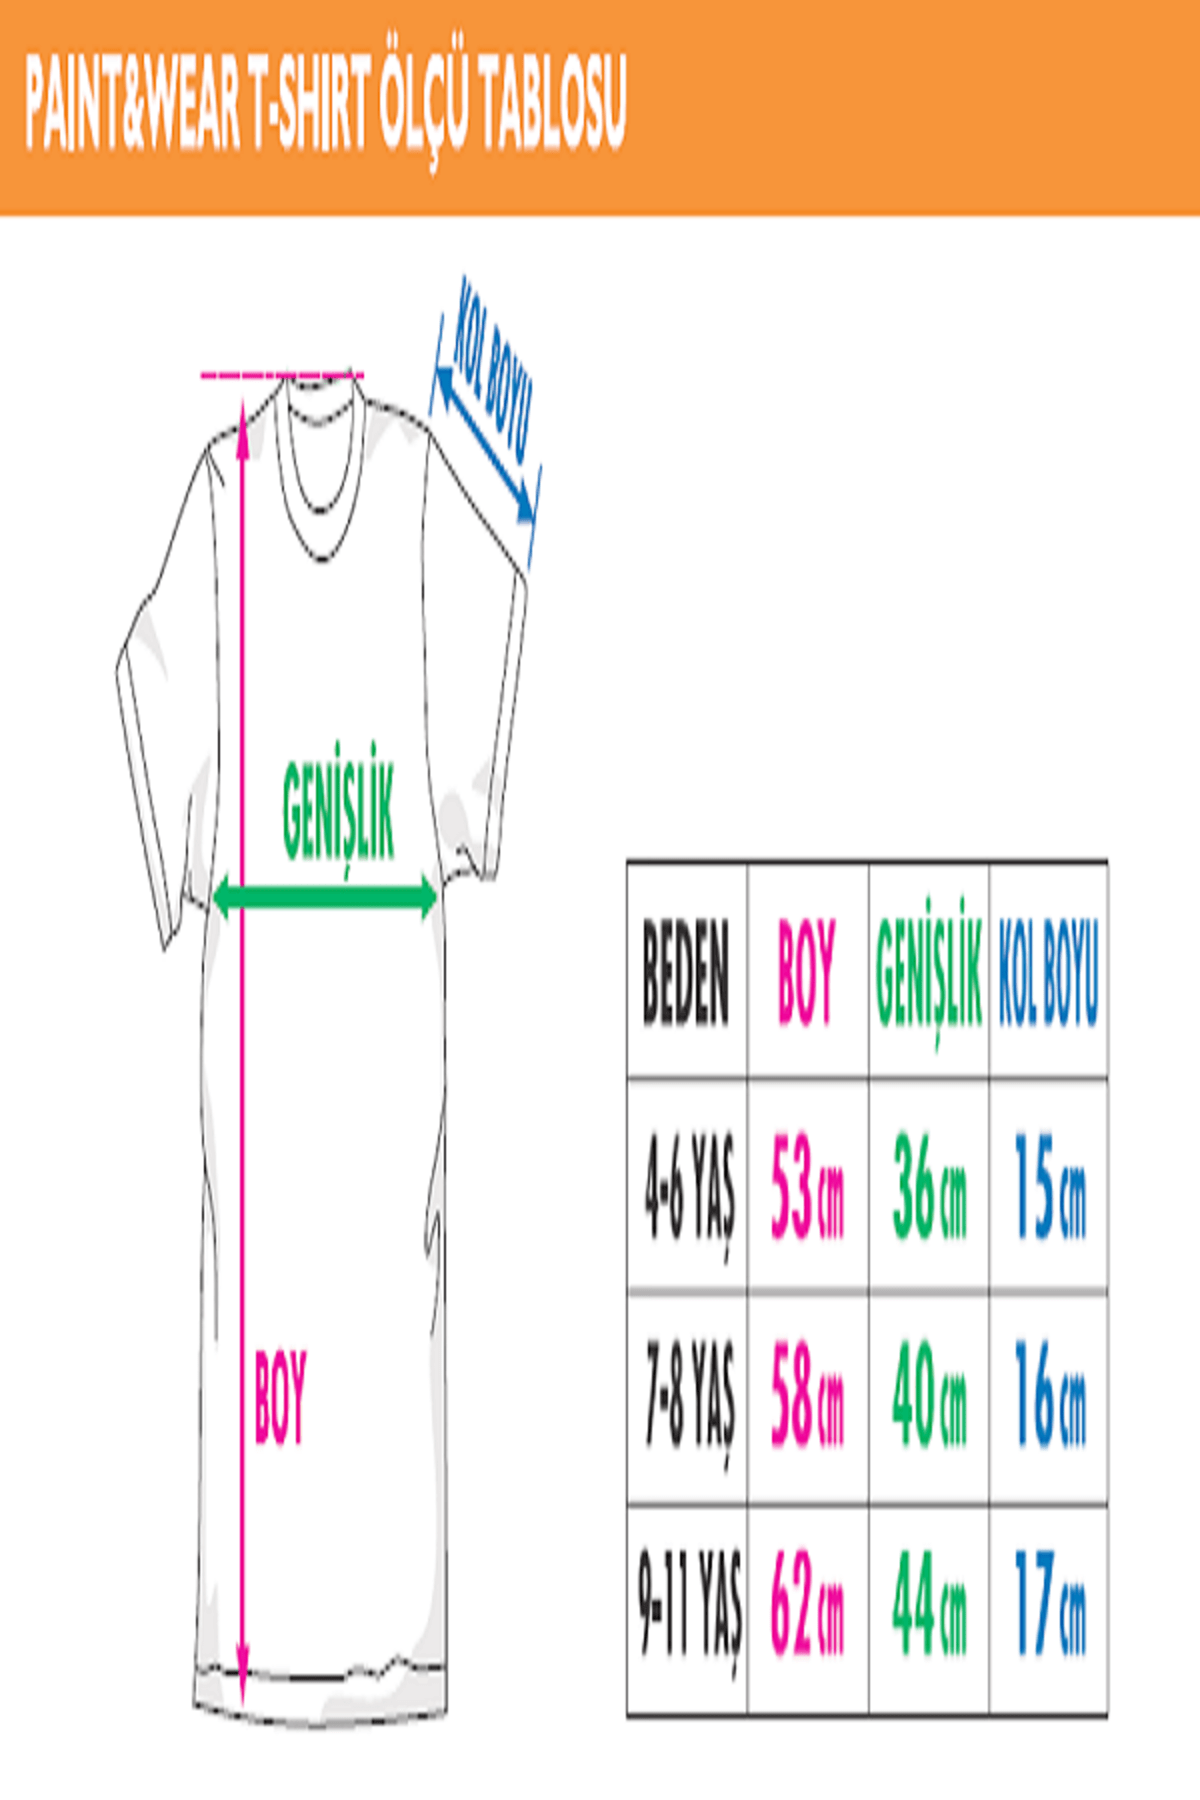 paint-wear Dinazor Ailesi Boyama T-shirt 7-8 Yaş 3